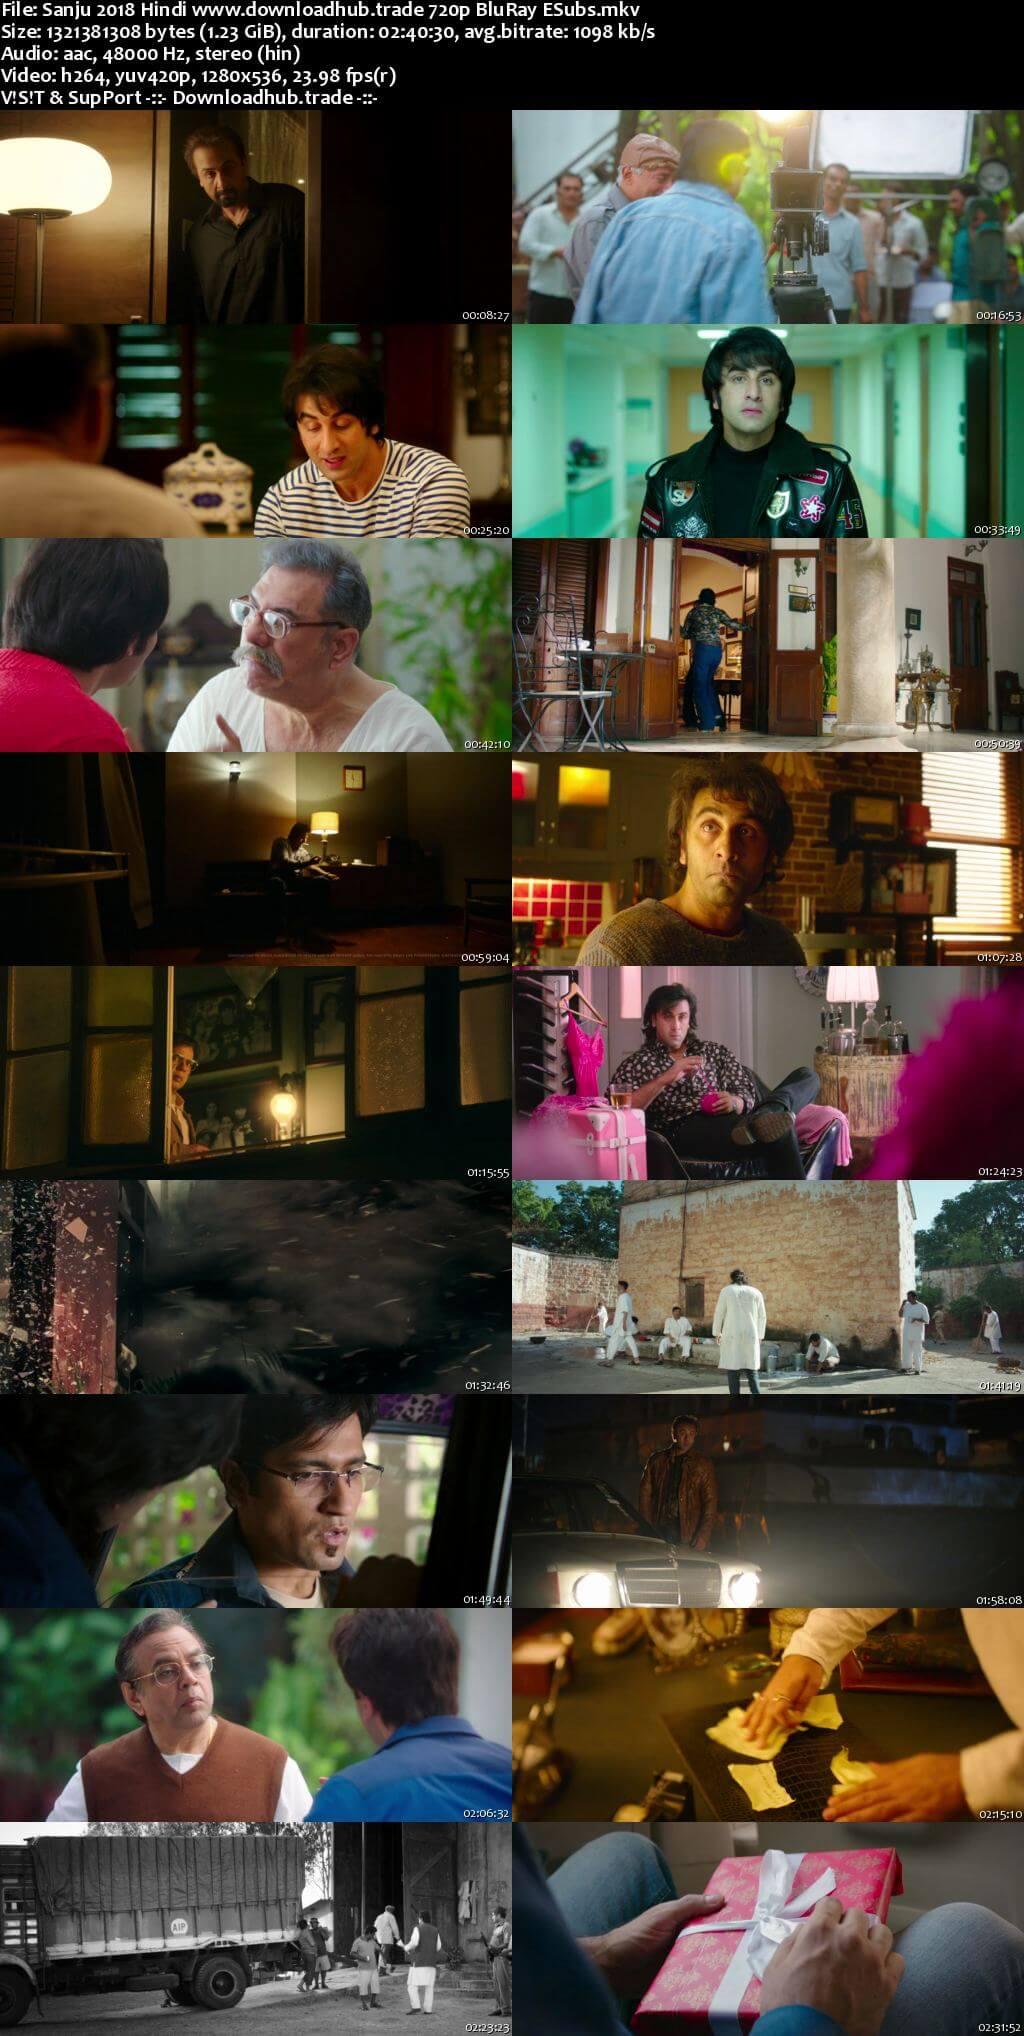 Sanju 2018 Hindi 720p BluRay ESubs